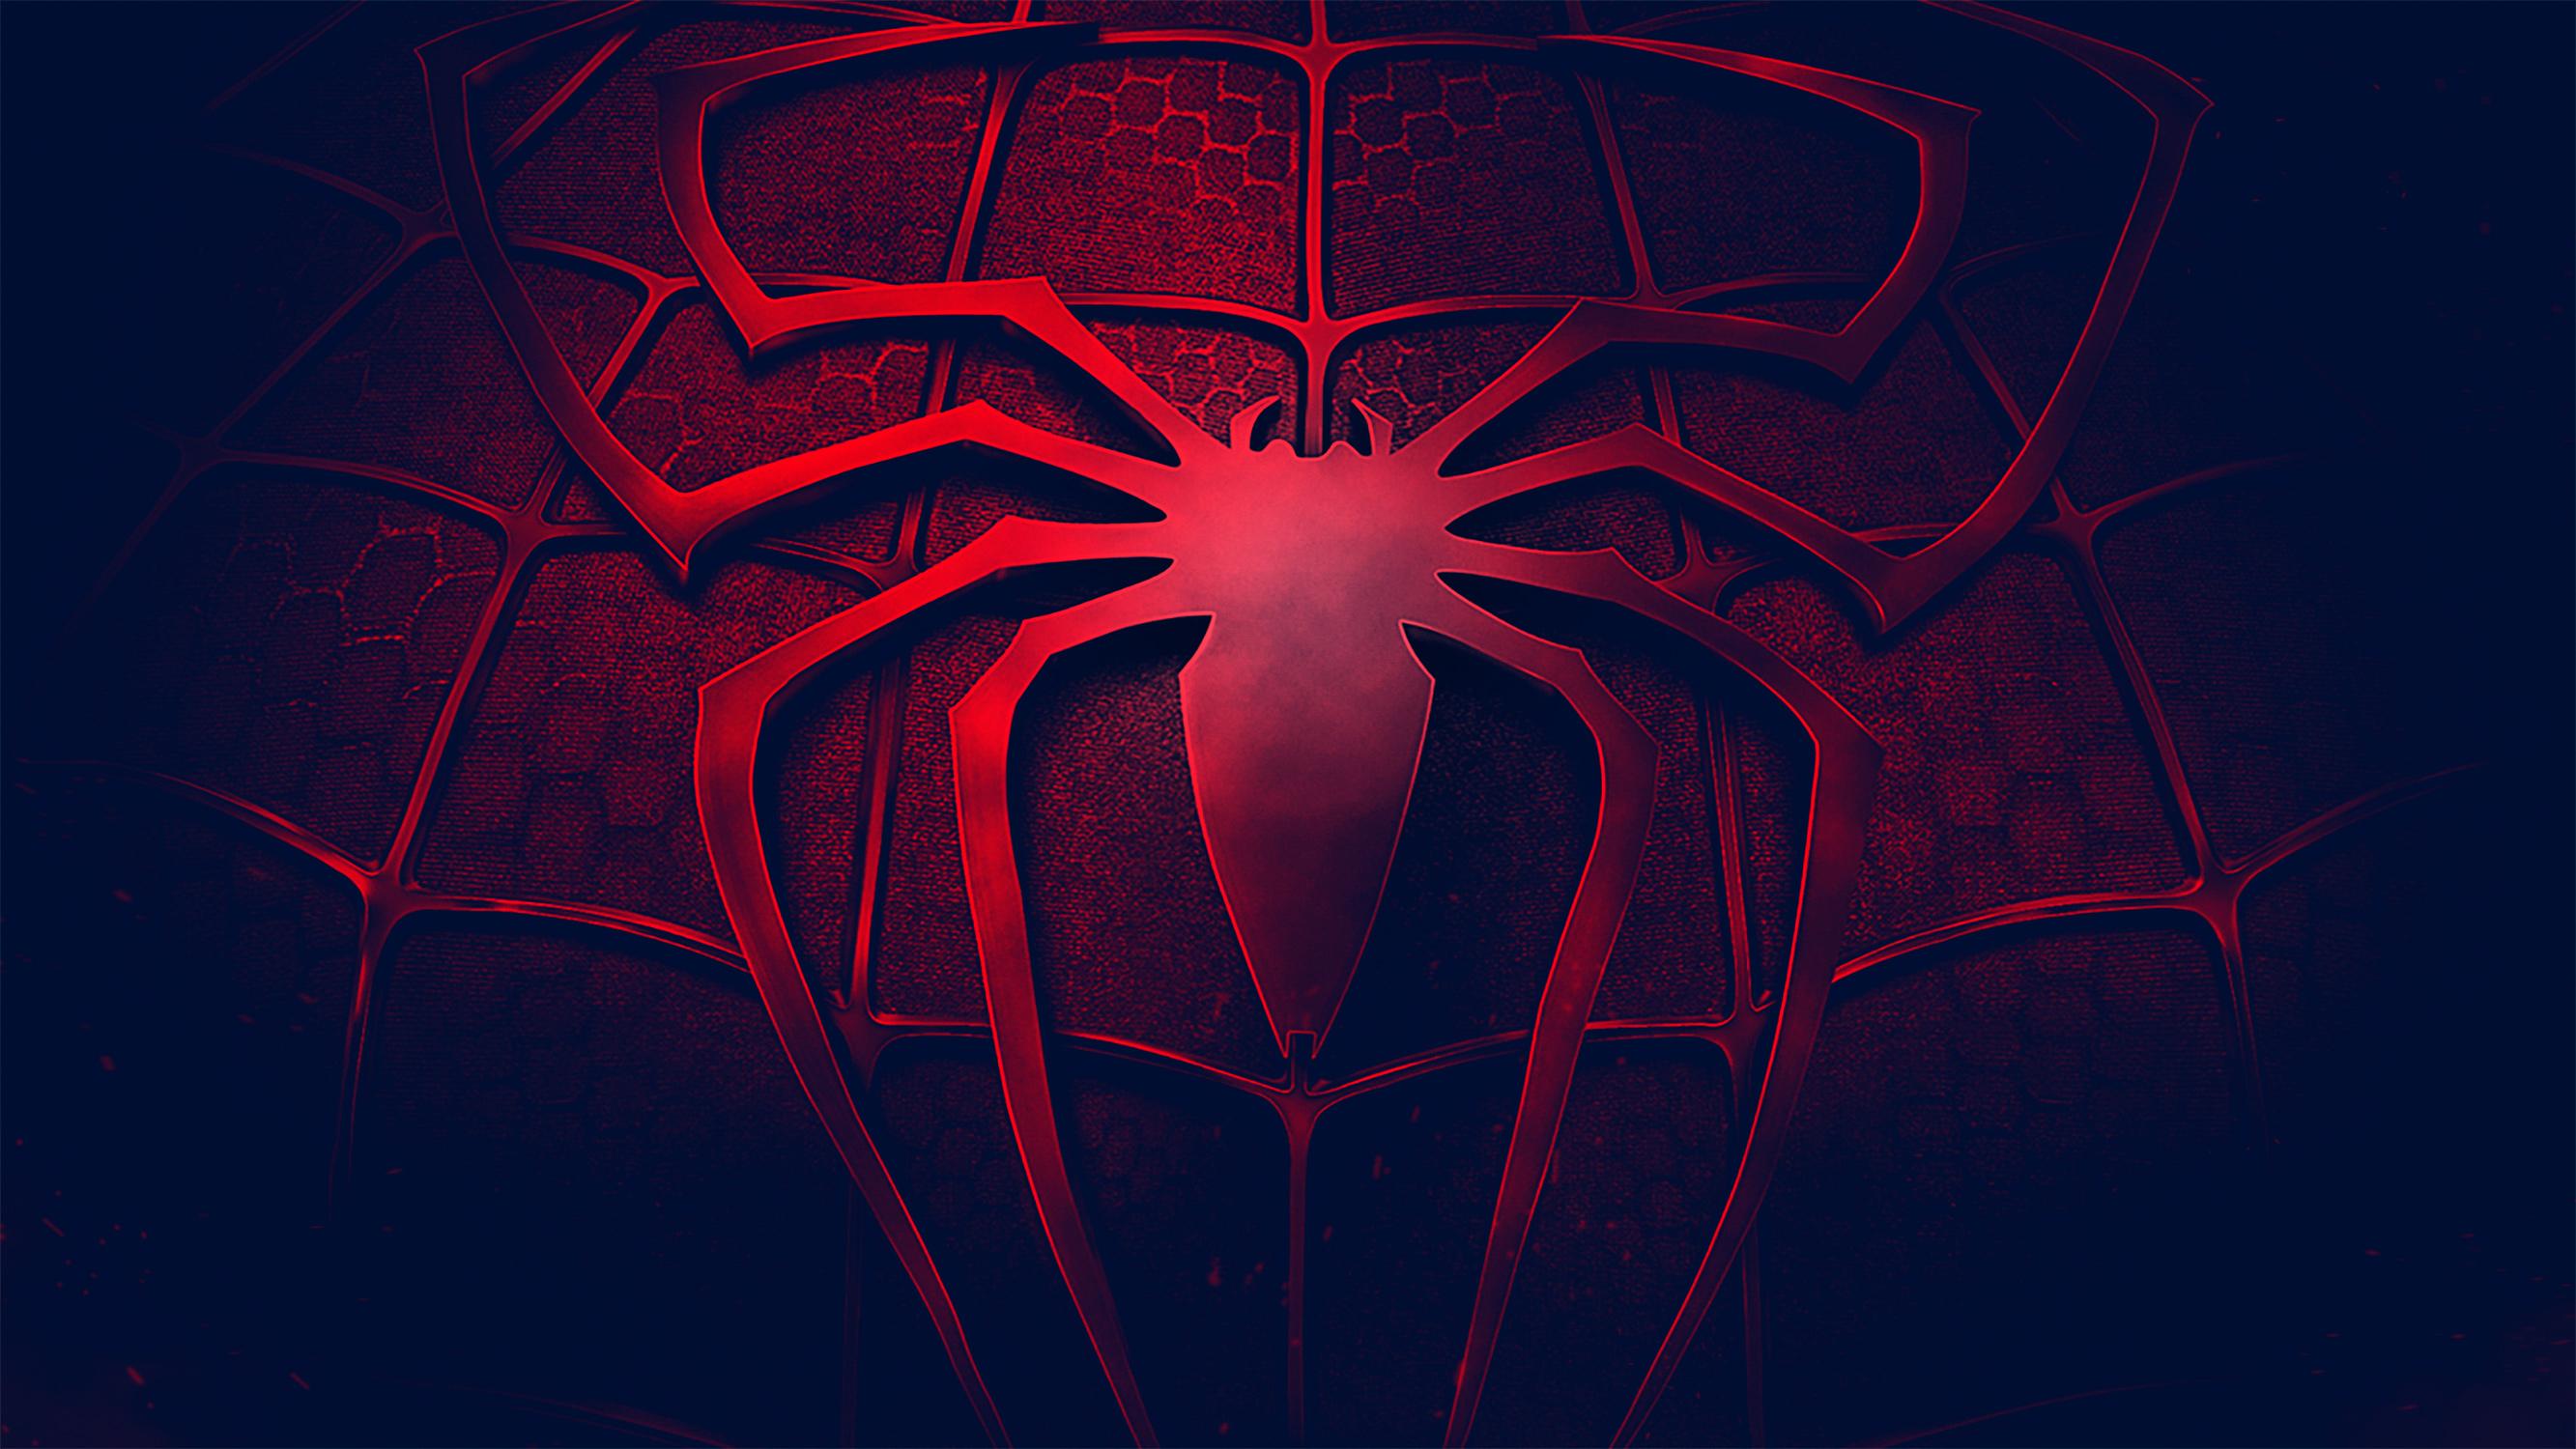 Logo Spiderman Wallpaper 4k - 2666x1500 - Download HD ...